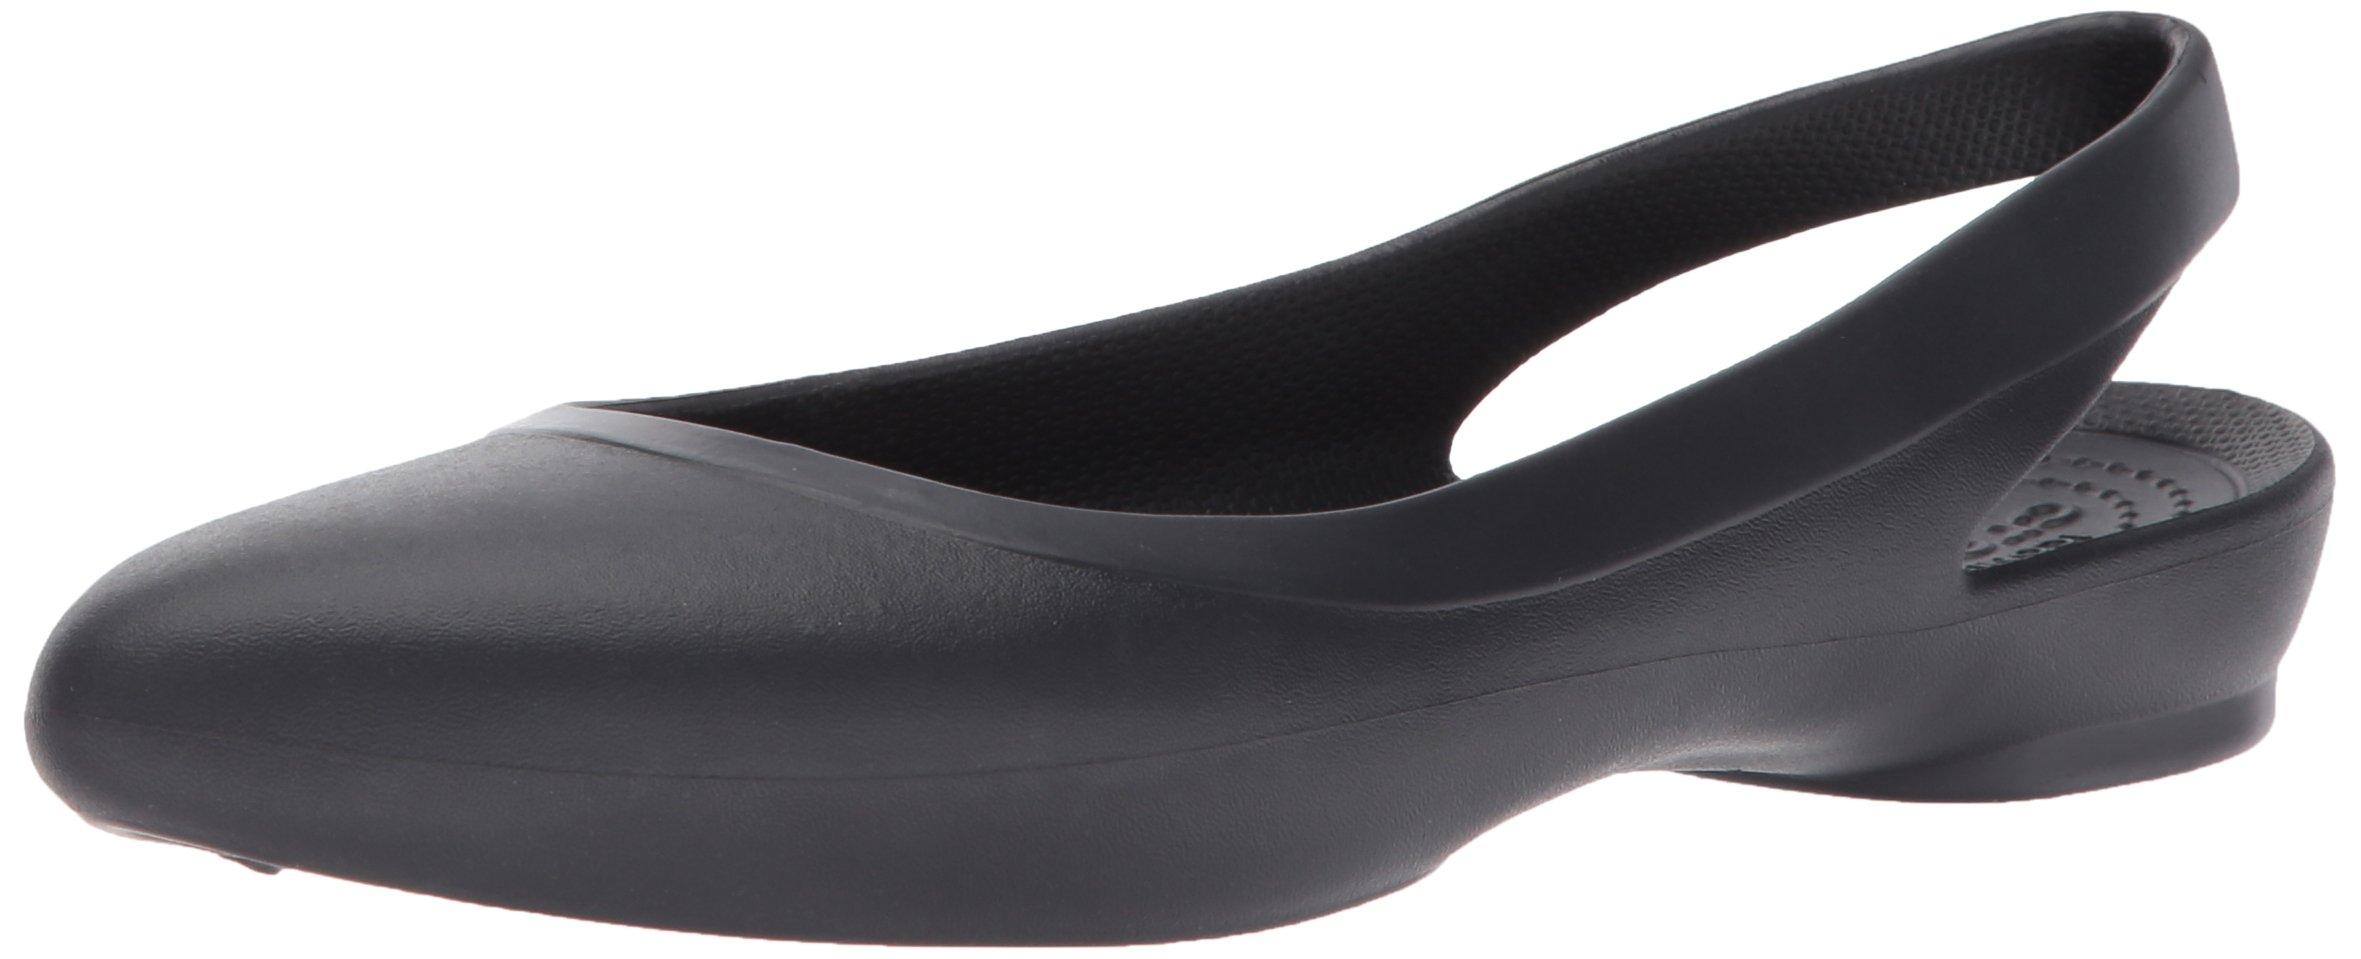 Crocs Women's Eve Slingback W Ballet Flat,Black,8 M US